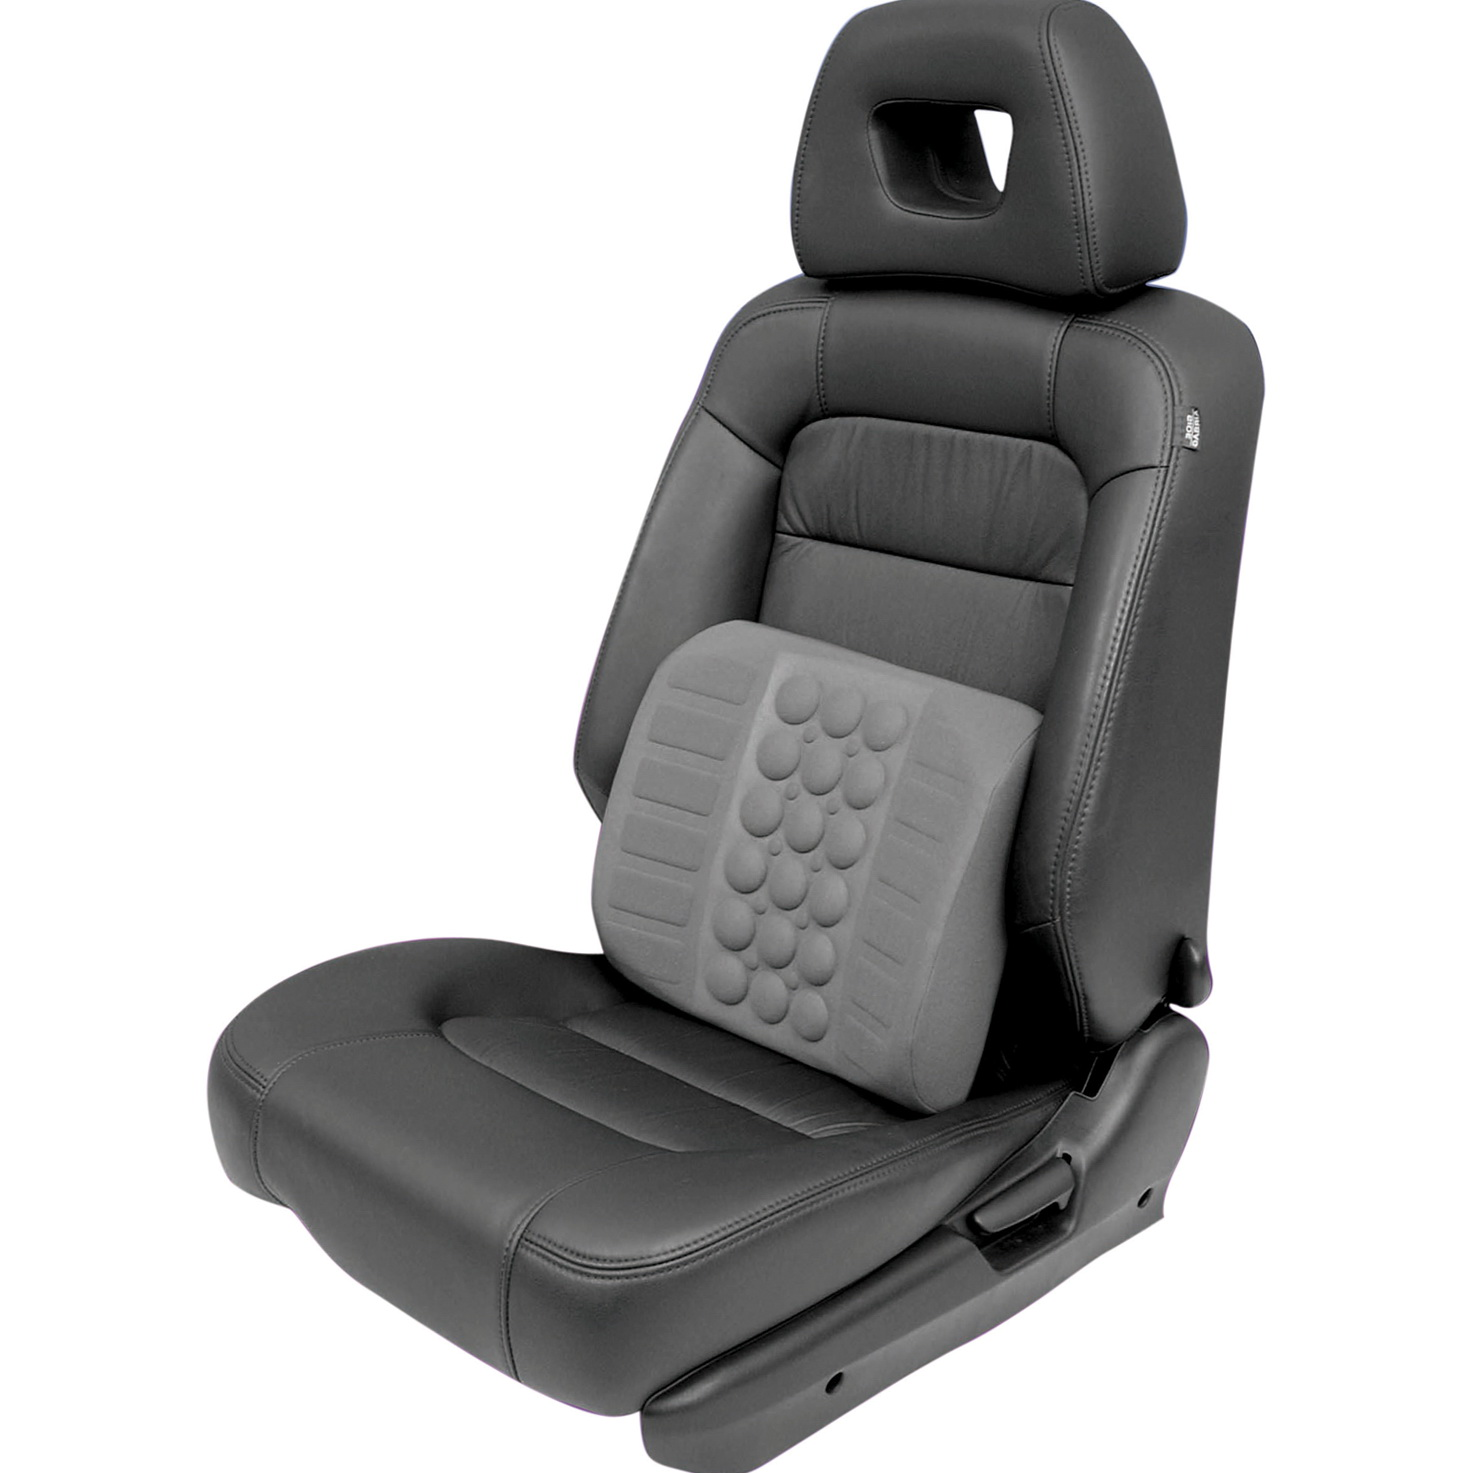 Lumbar Support Car Seat Cushion